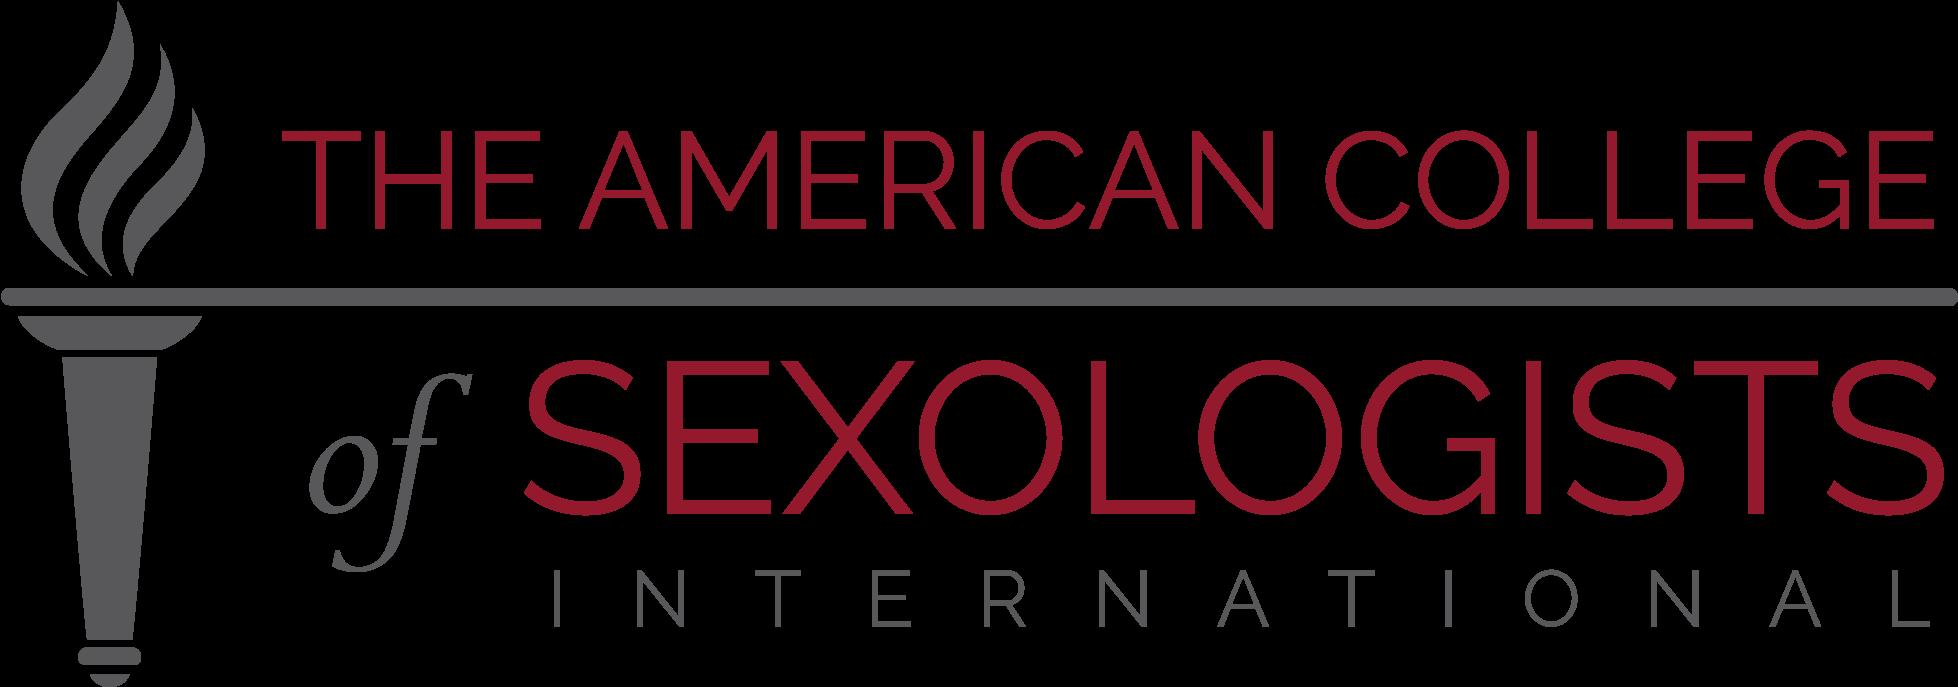 American College of Sexologists International Logo